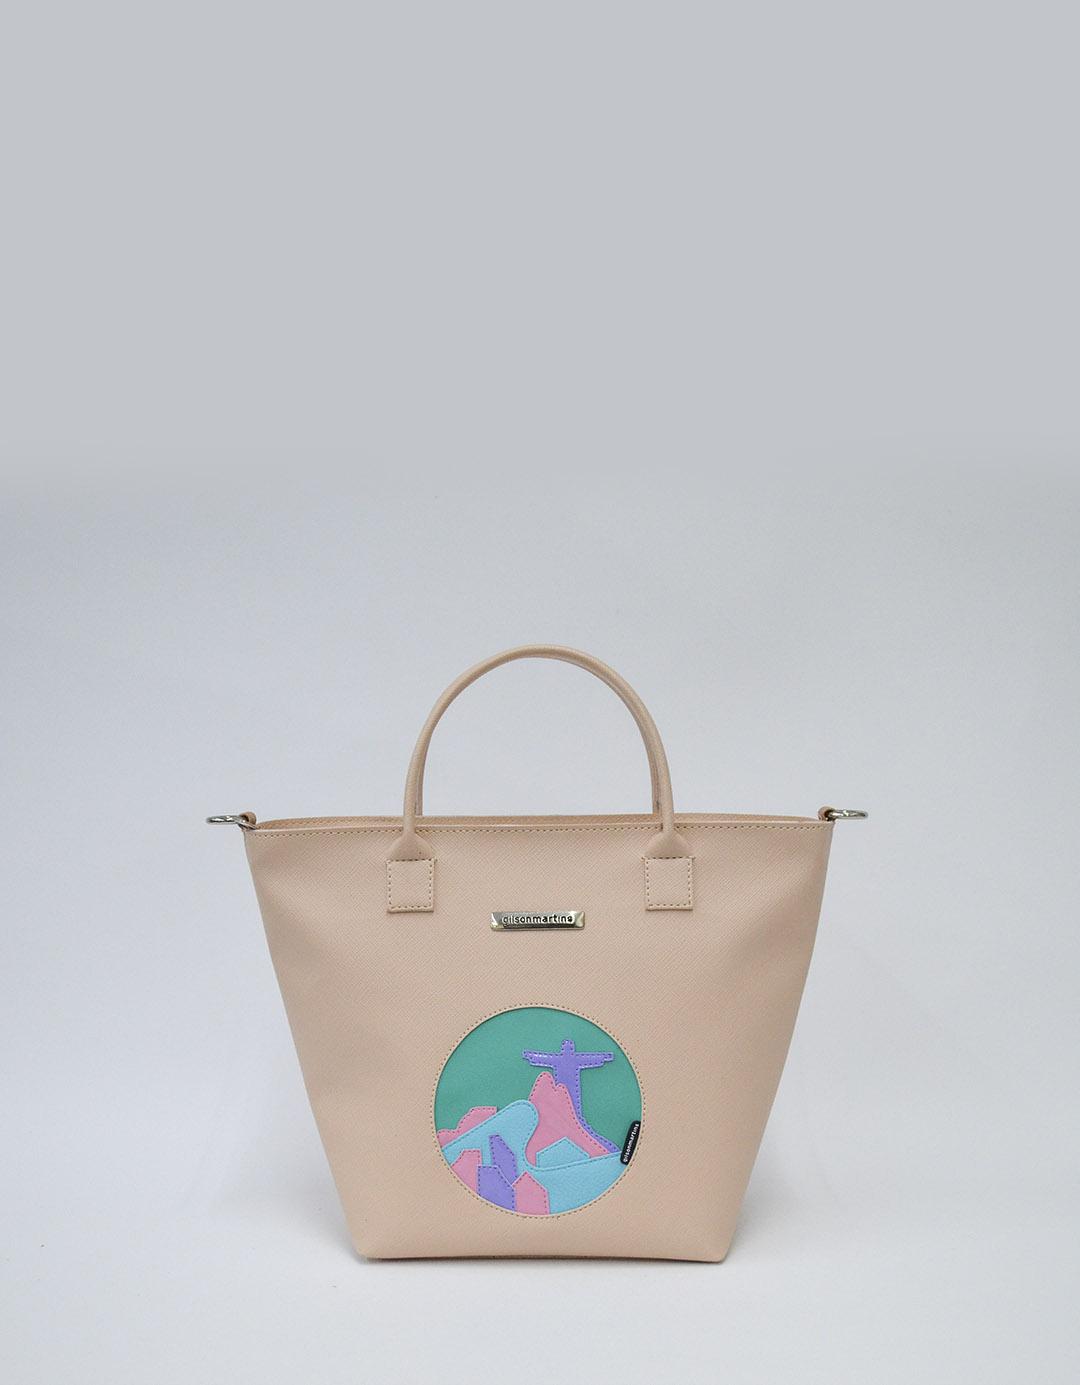 Bolsa Customizada Nude Exclusiva Bela Lixo Nobre